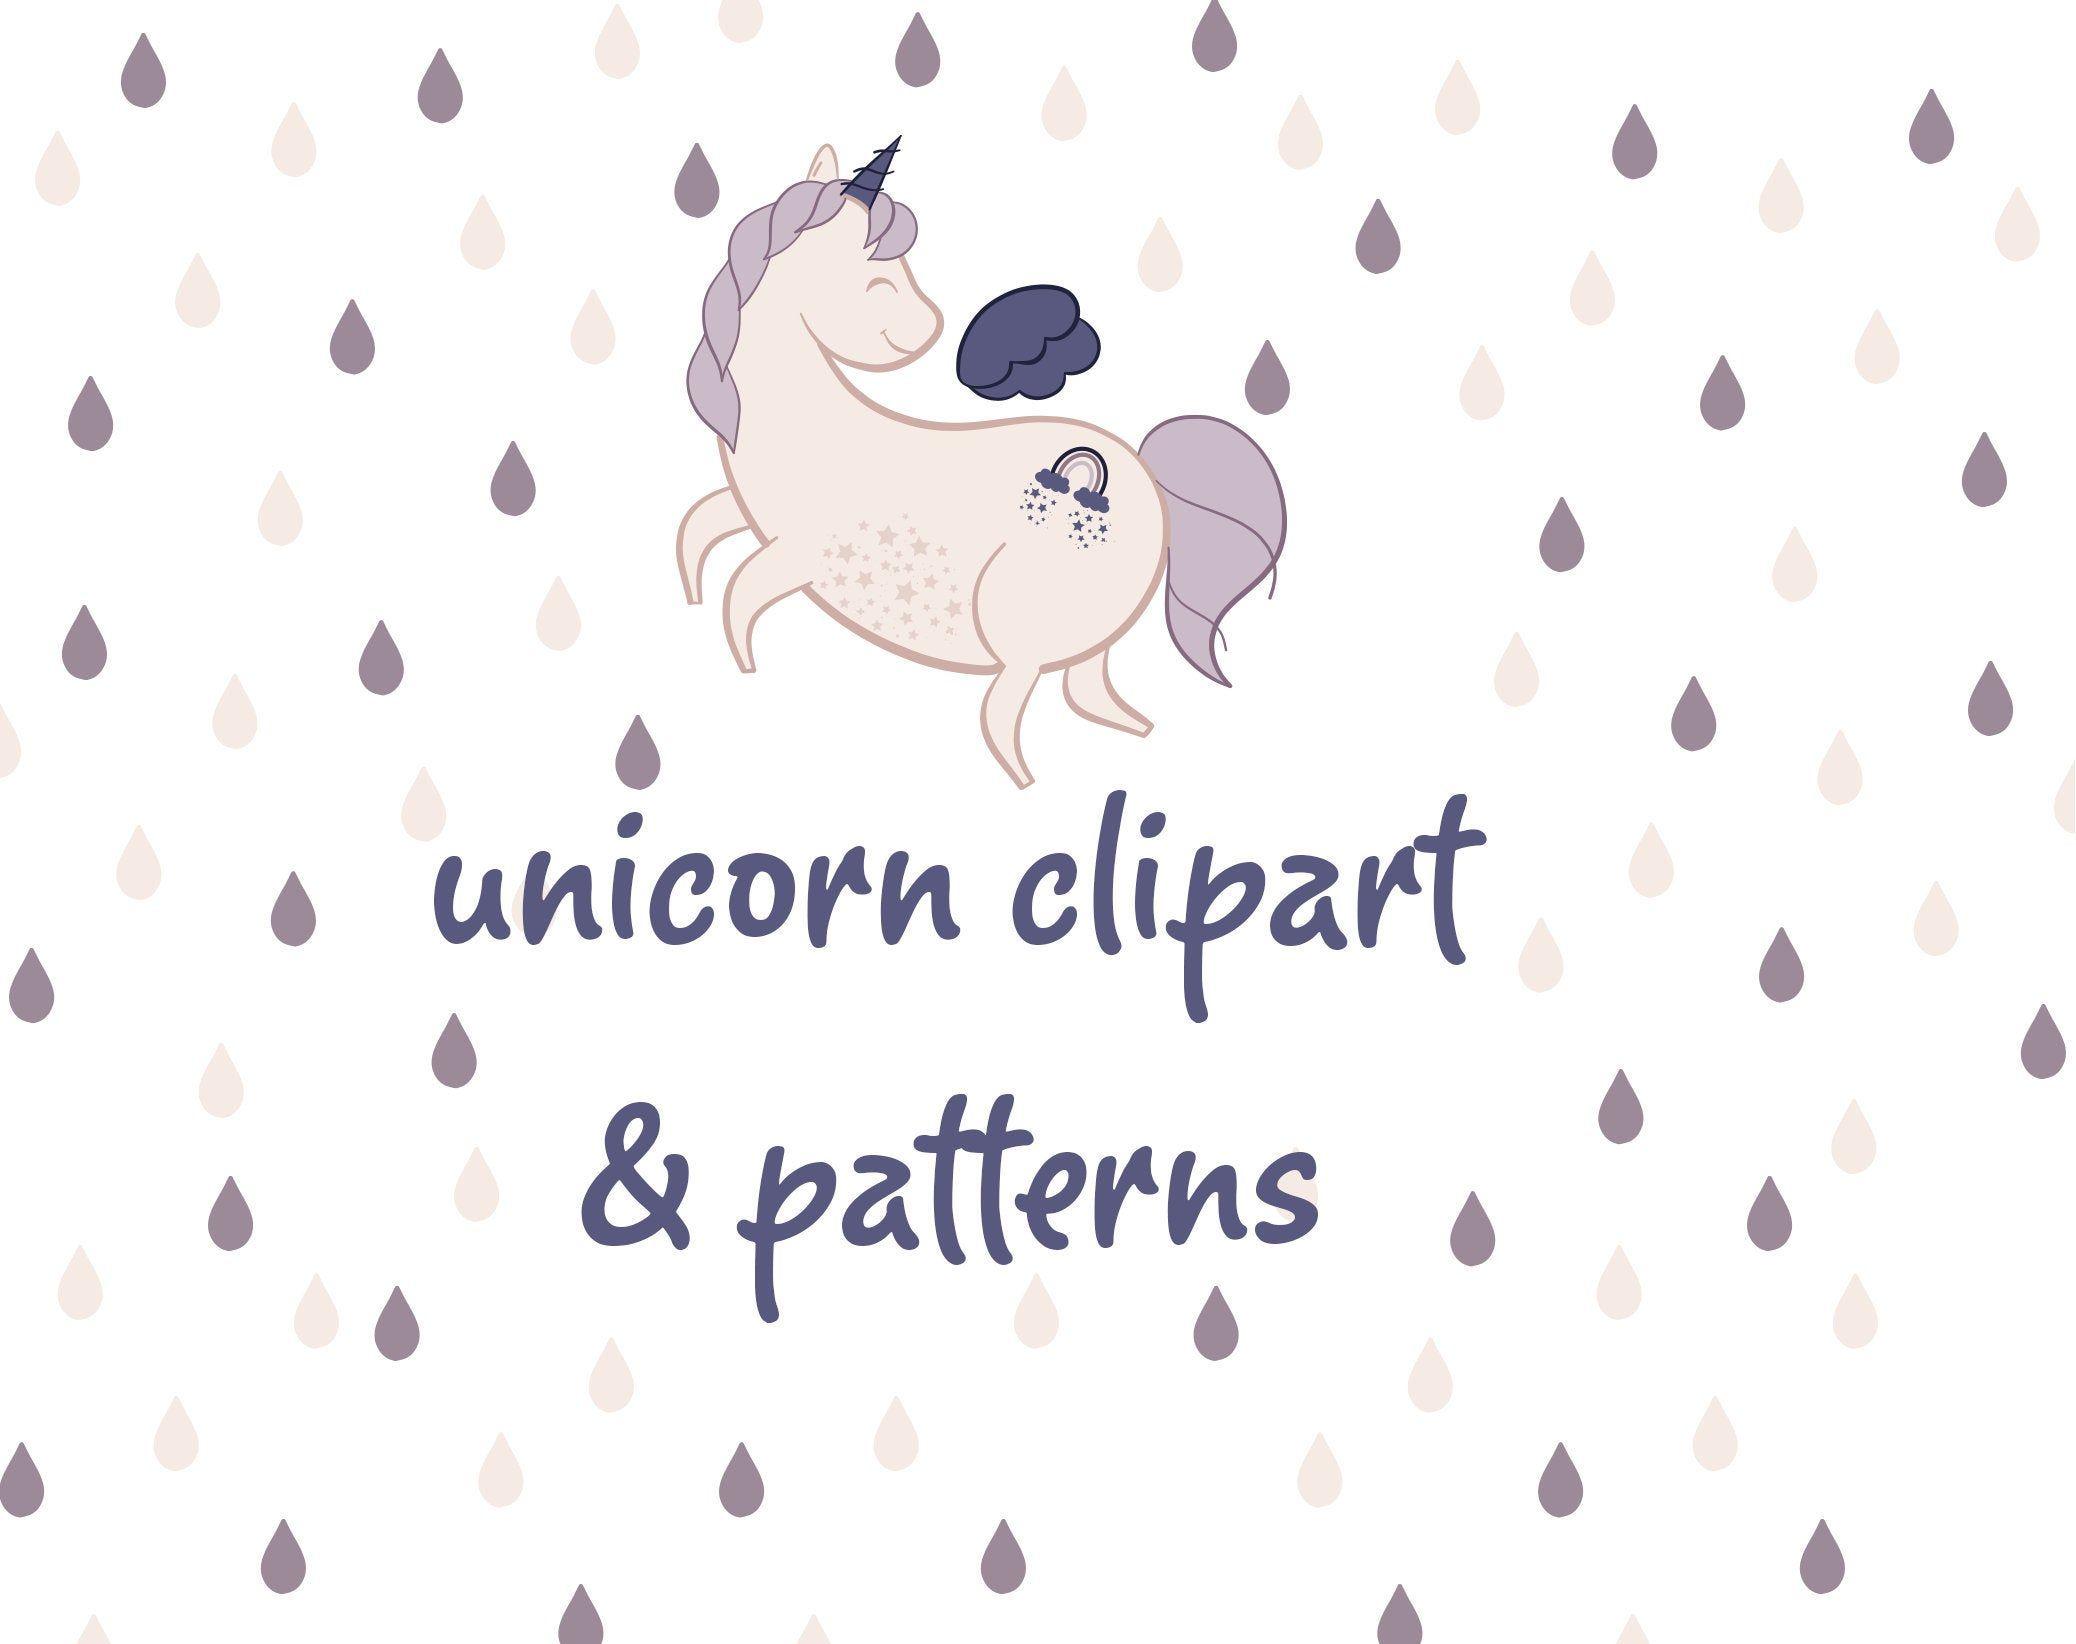 Rainbow Unicorn Clipart And Seamless Patterns Eps Ai Vector Etsy In 2020 Clip Art Unicorns Clipart Rainbow Unicorn